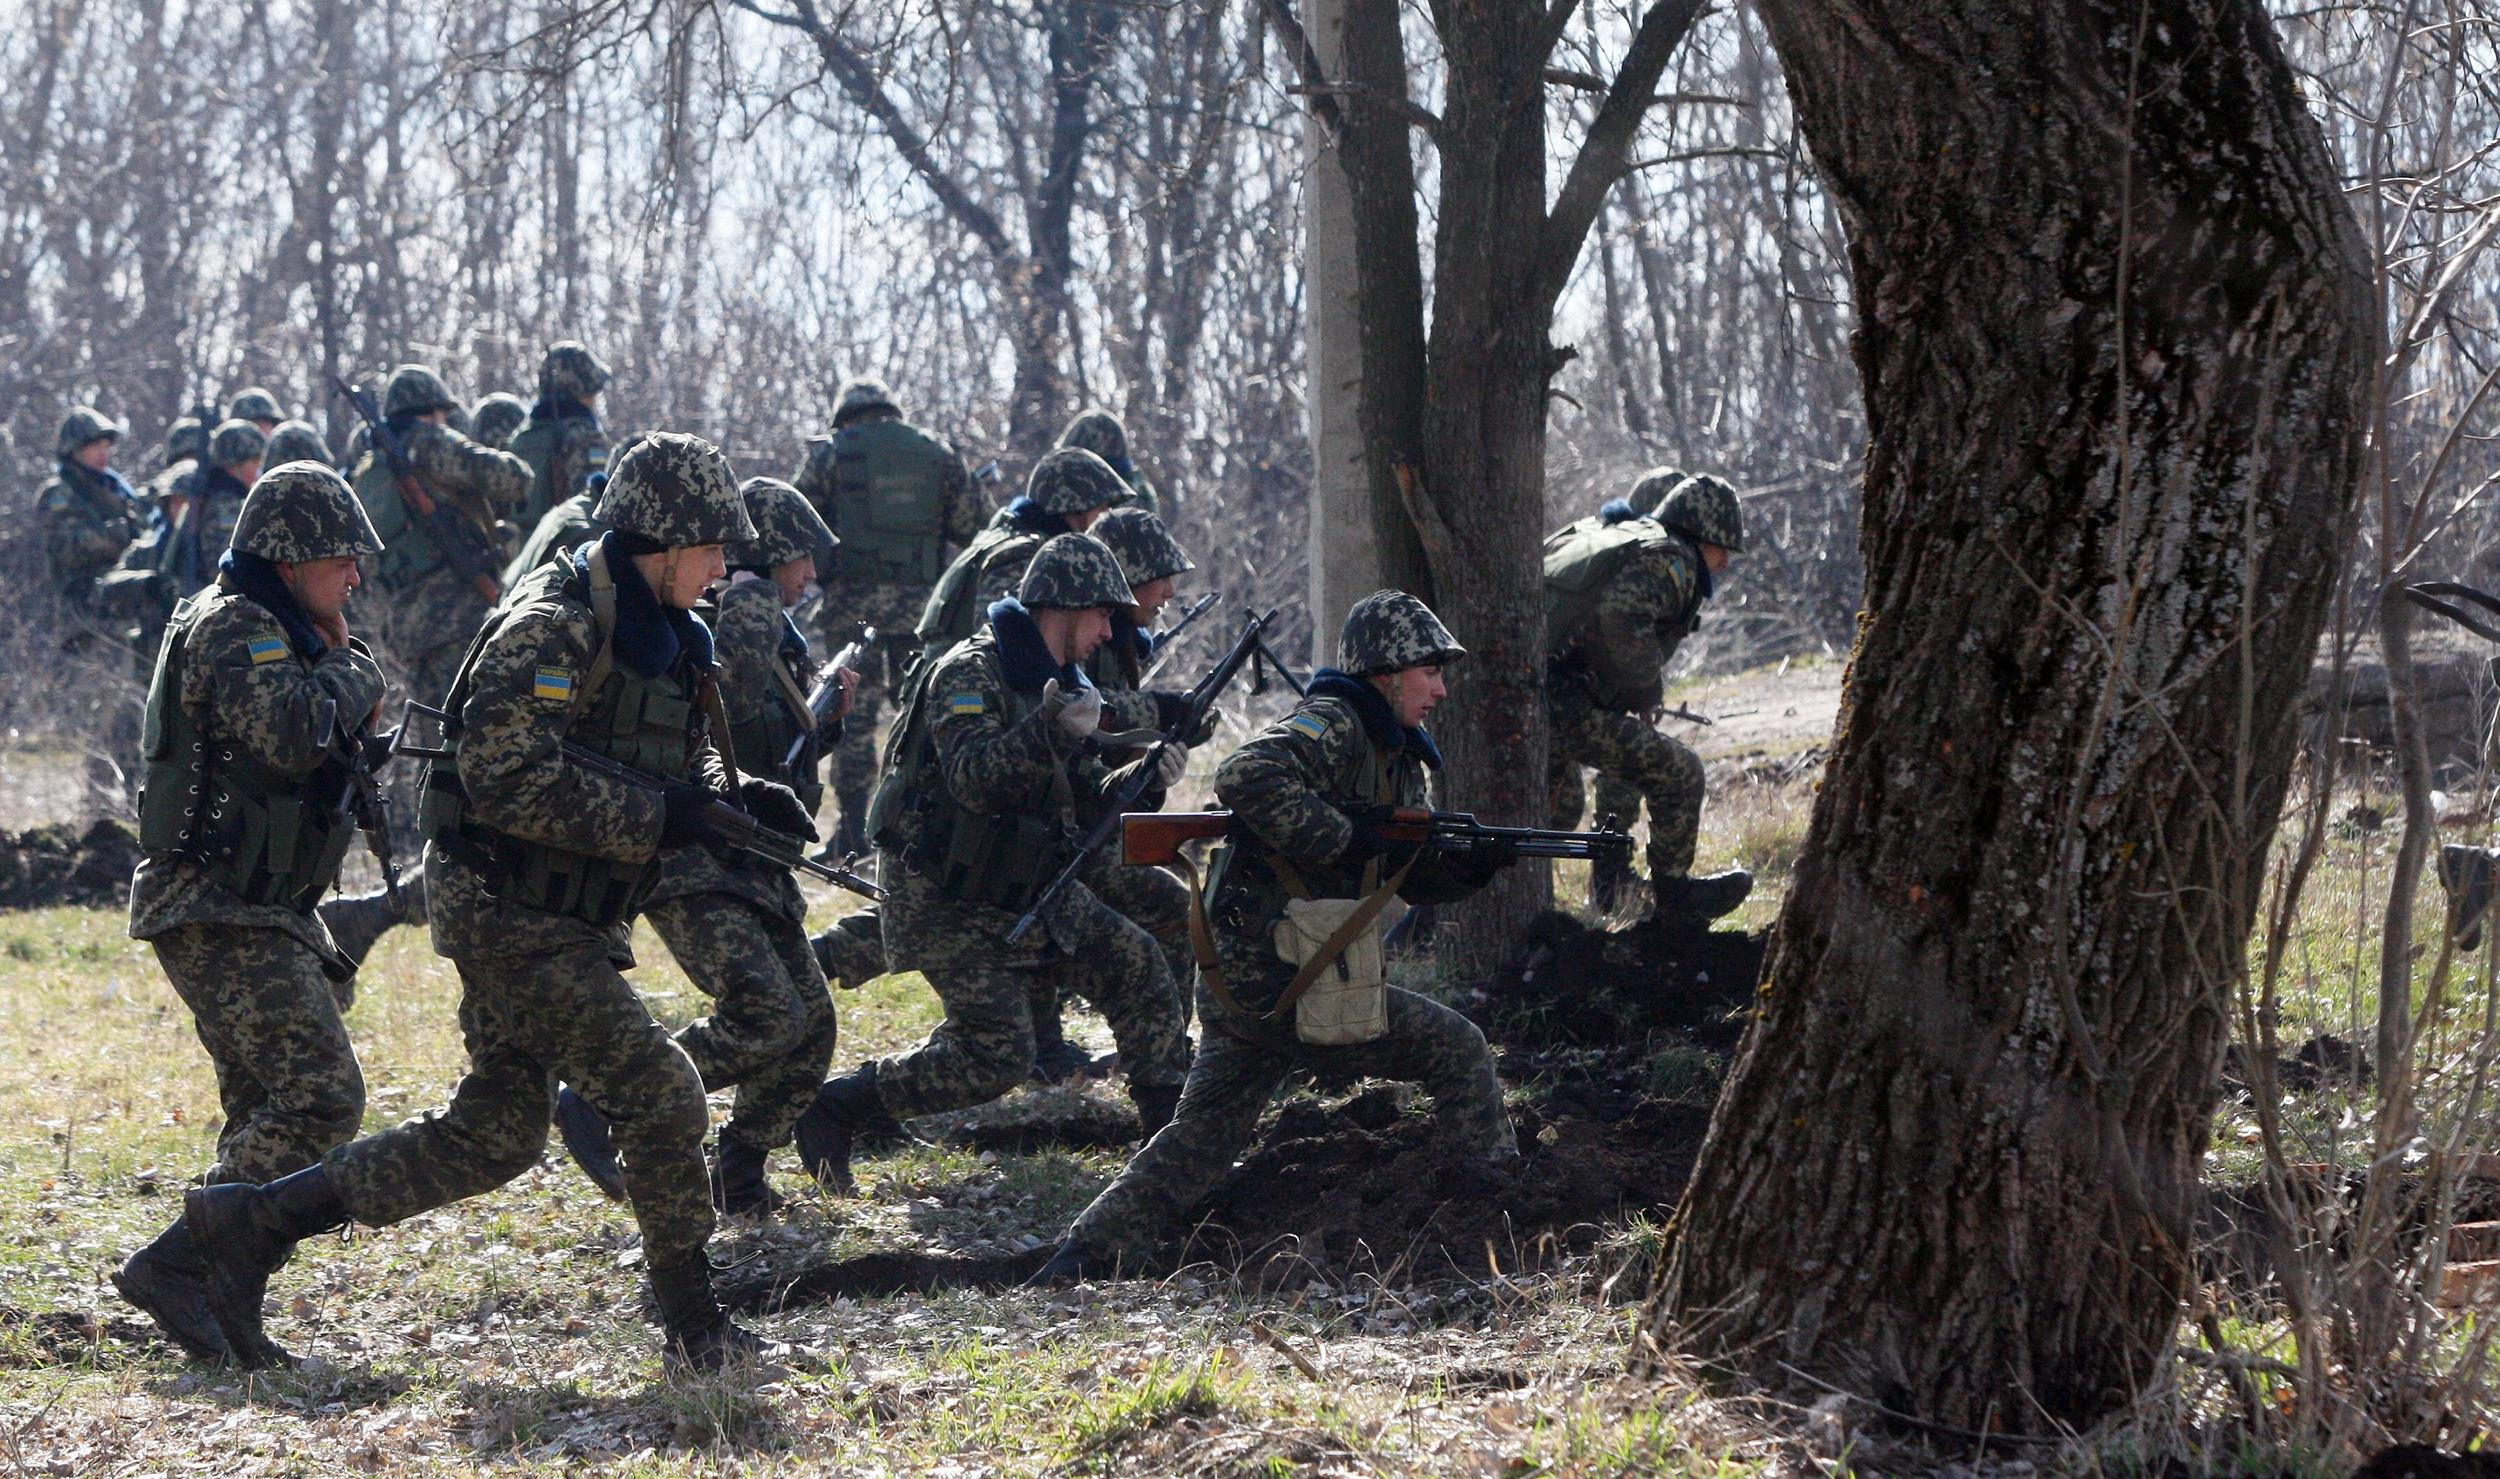 Image: TOPSHOTS-UKRAINE-RUSSIA-POLITICS-CRISIS-BORDER-MILITARY